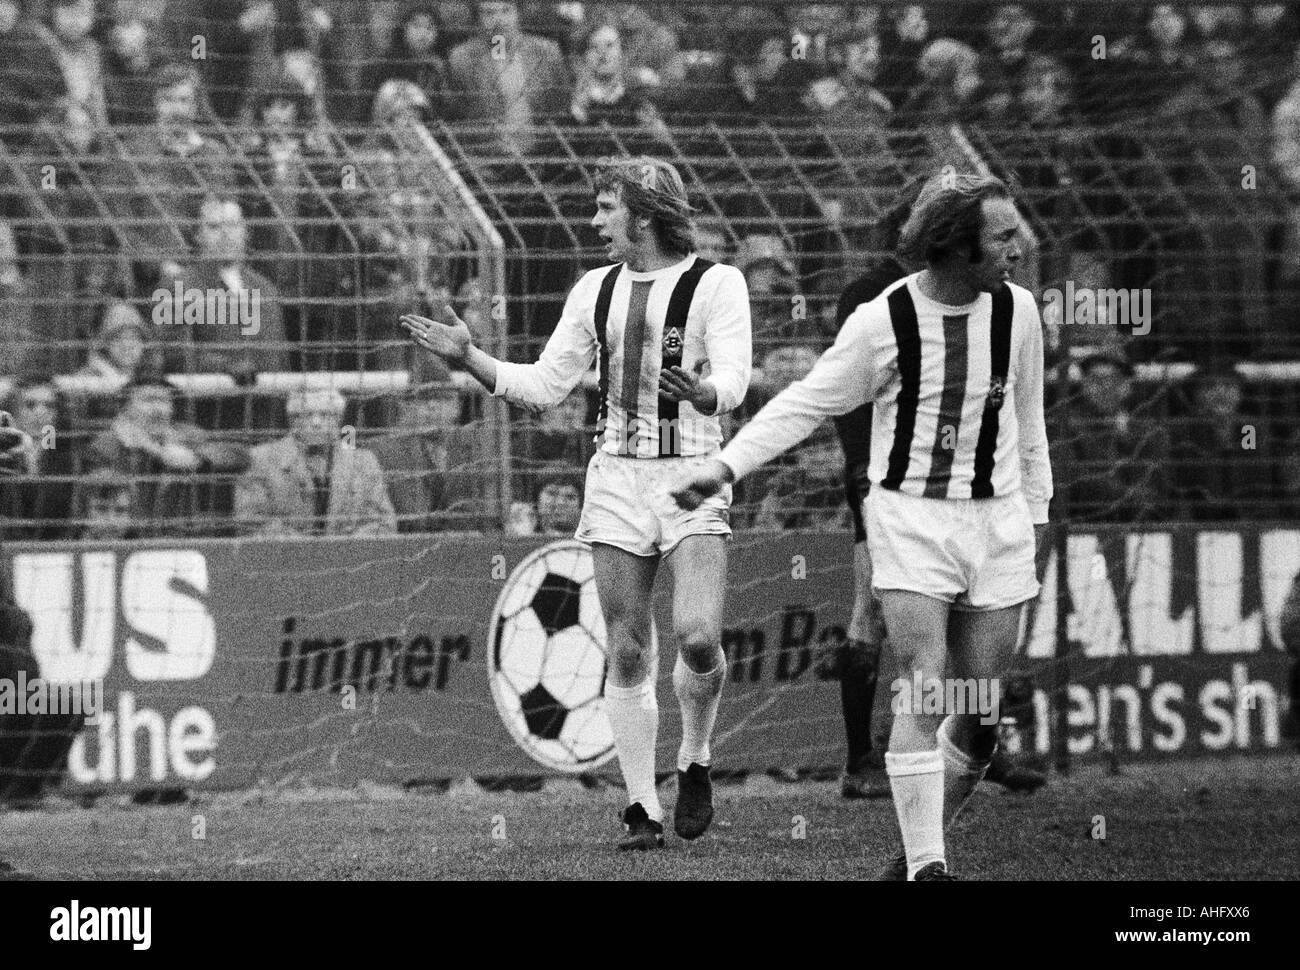 football, Bundesliga, 1972/1973, Borussia Moenchengladbach versus FC Bayern Munich 0:3, Boekelberg Stadium, scene of the match, left Henning Jensen (MG), right Bernd Rupp (MG) - Stock Image